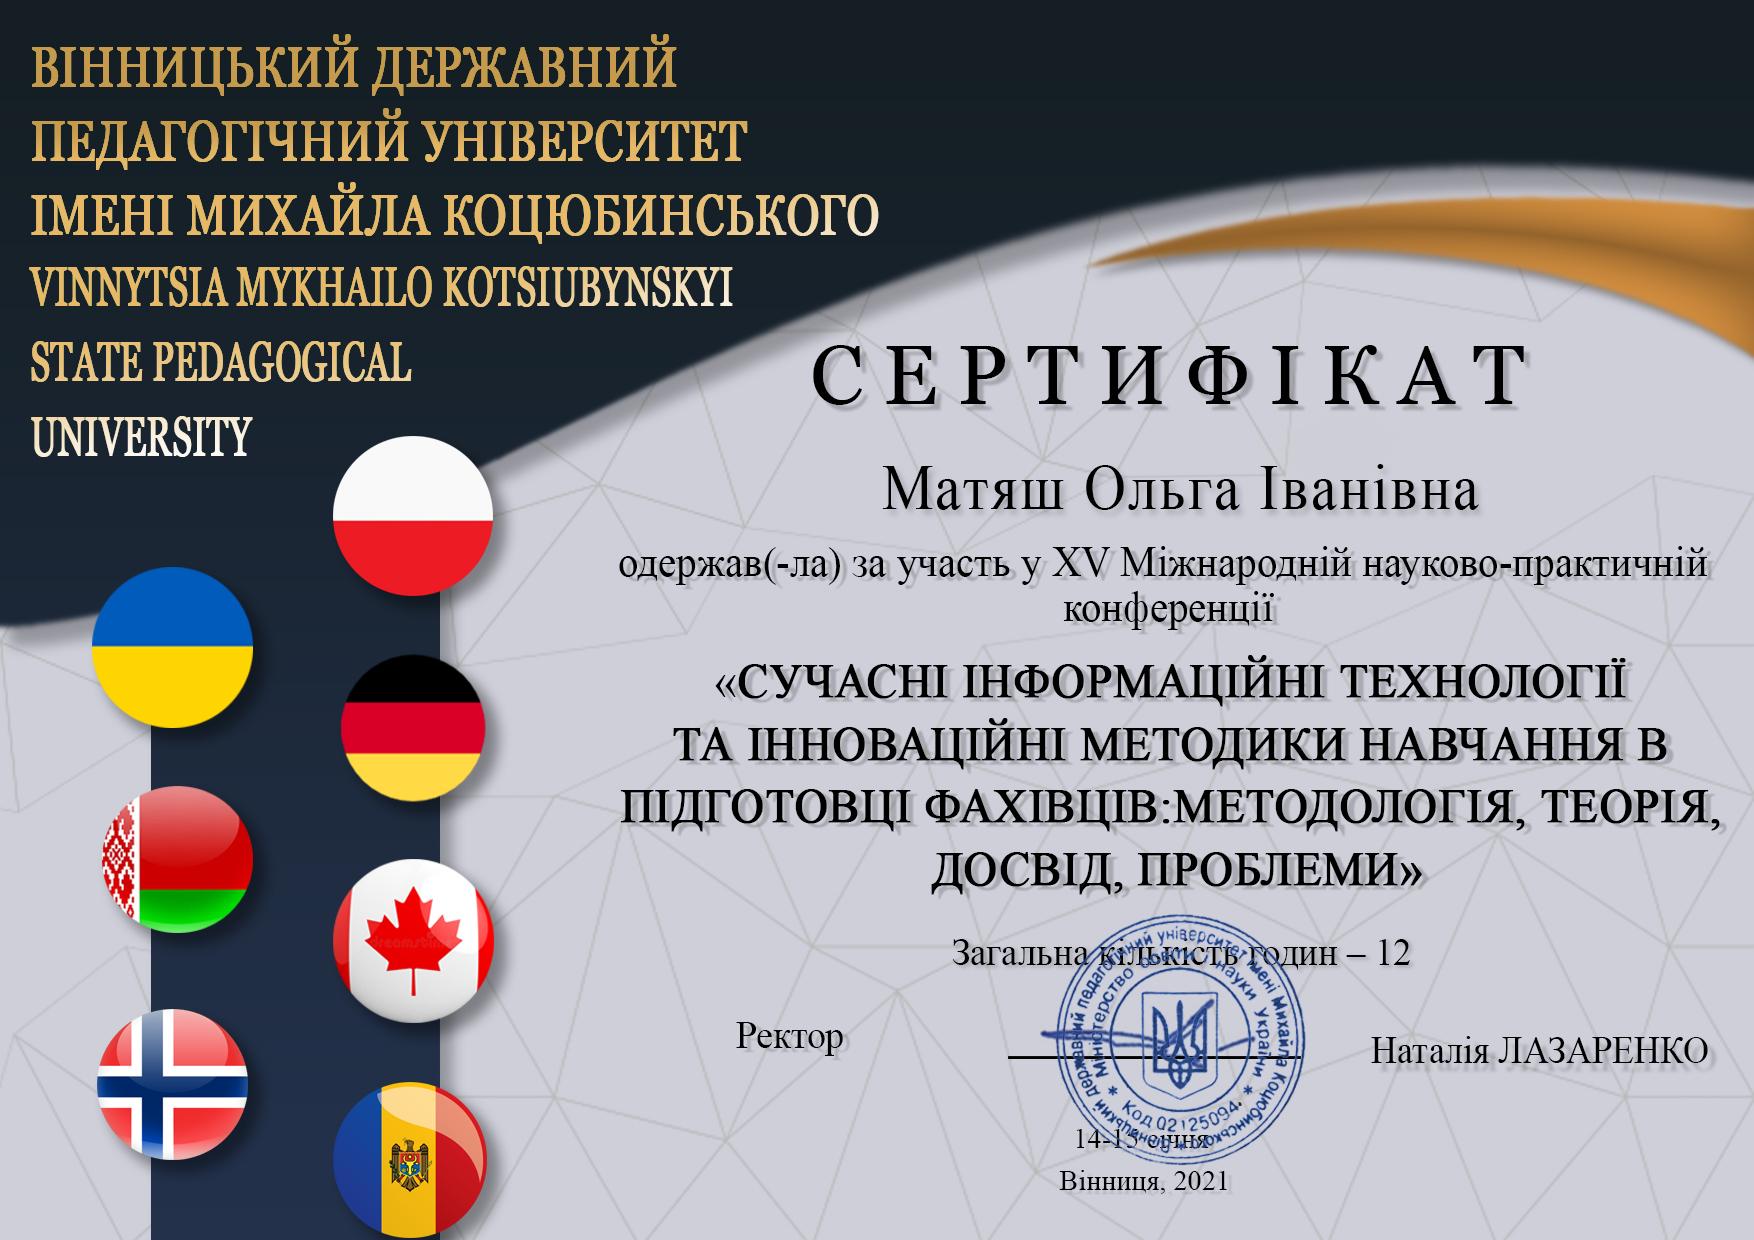 Матяш Ольга Іванівна